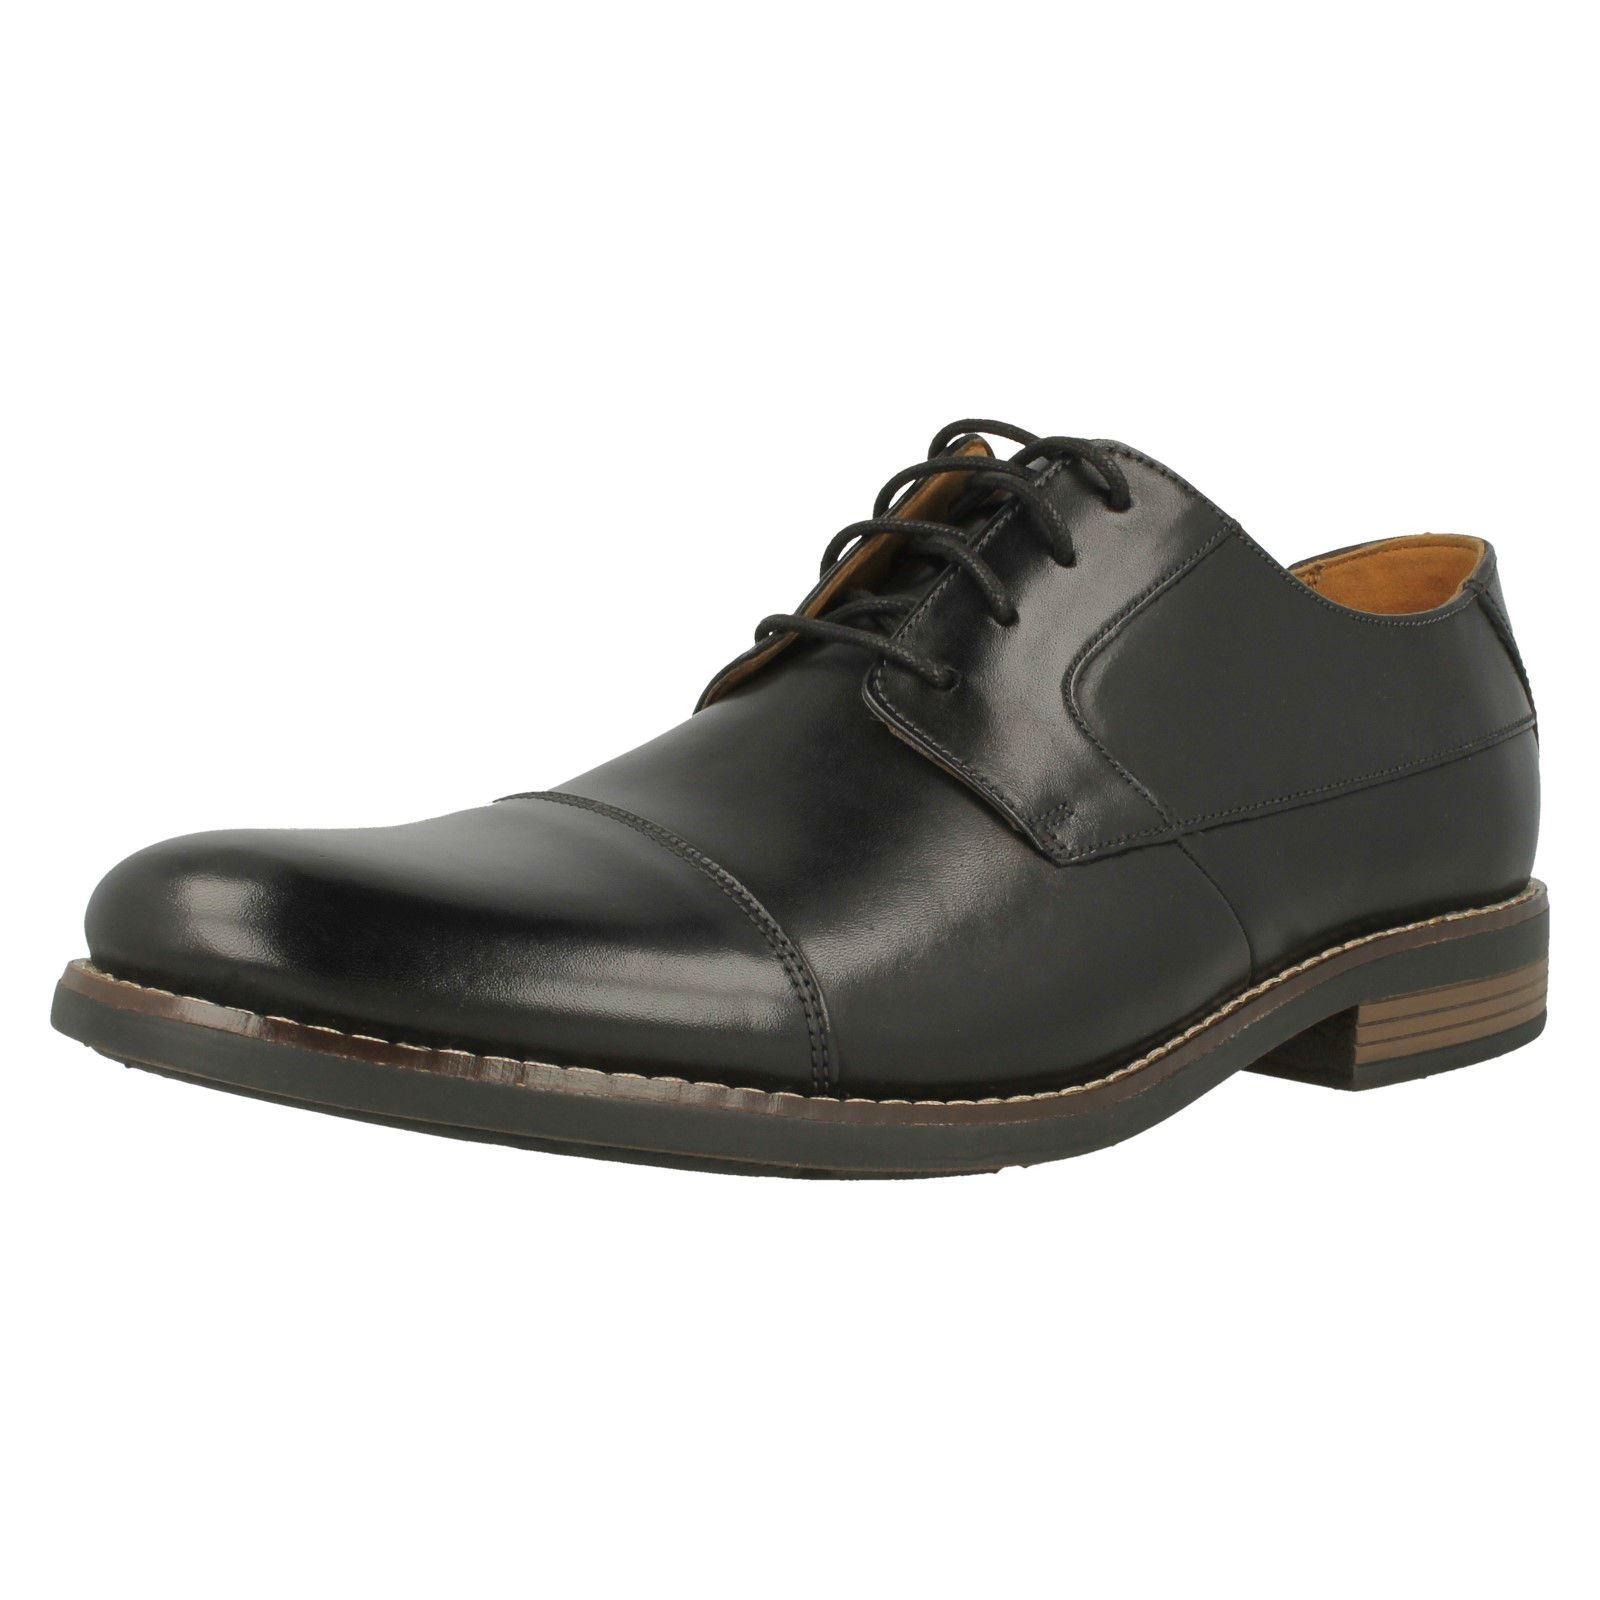 Clarks Becken Cap Men's Formal Shoes Size Uk 10.5 Brown Leather Lace Up EUR 45